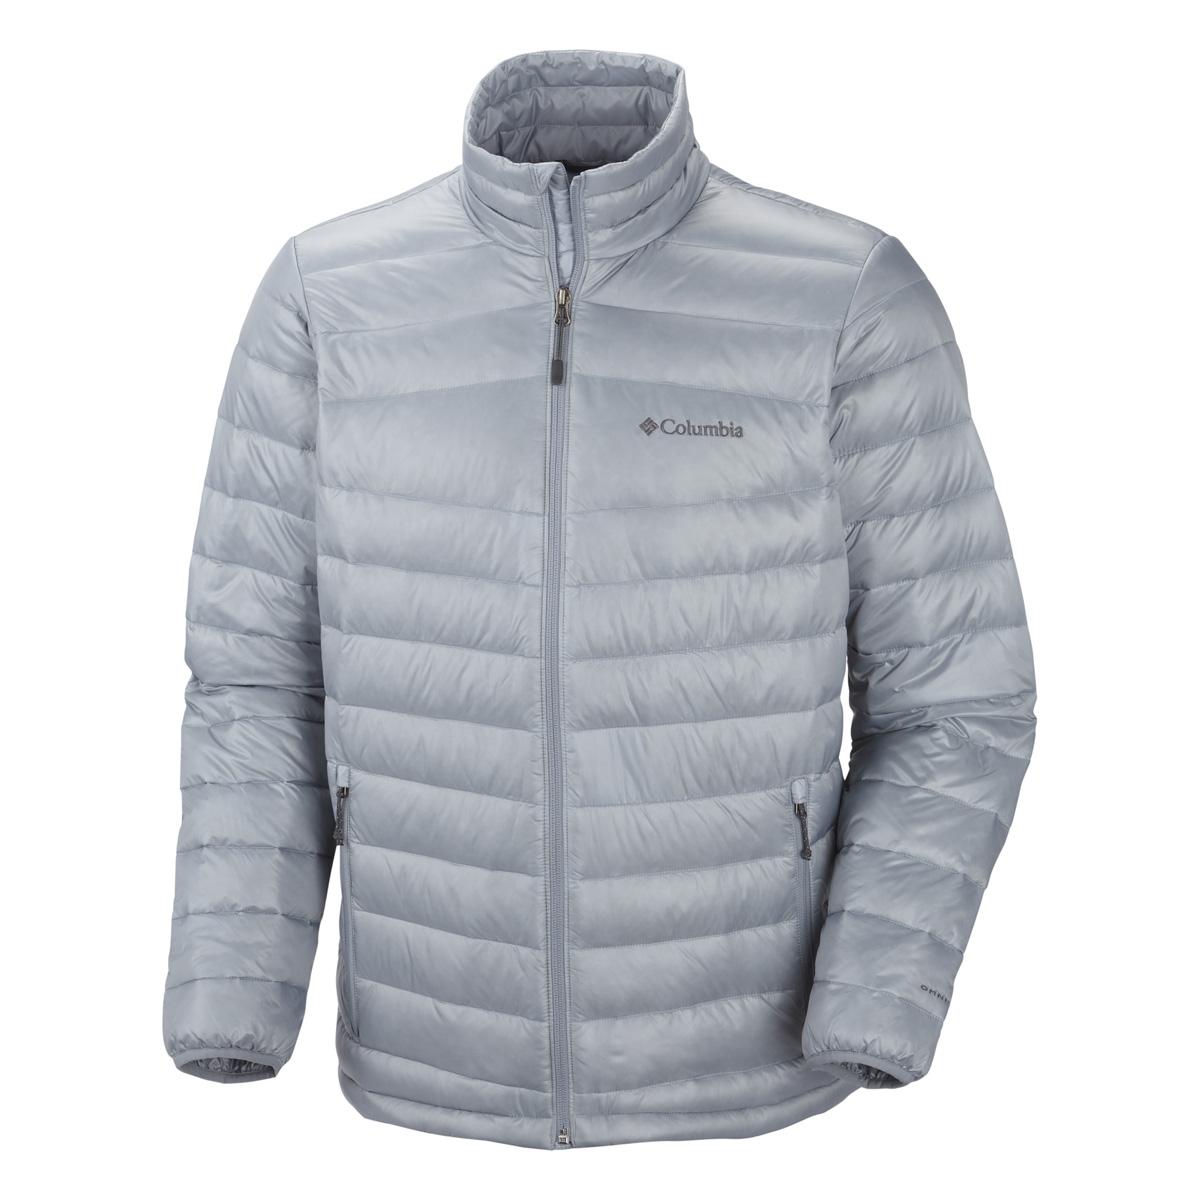 Buy columbia jackets online canada